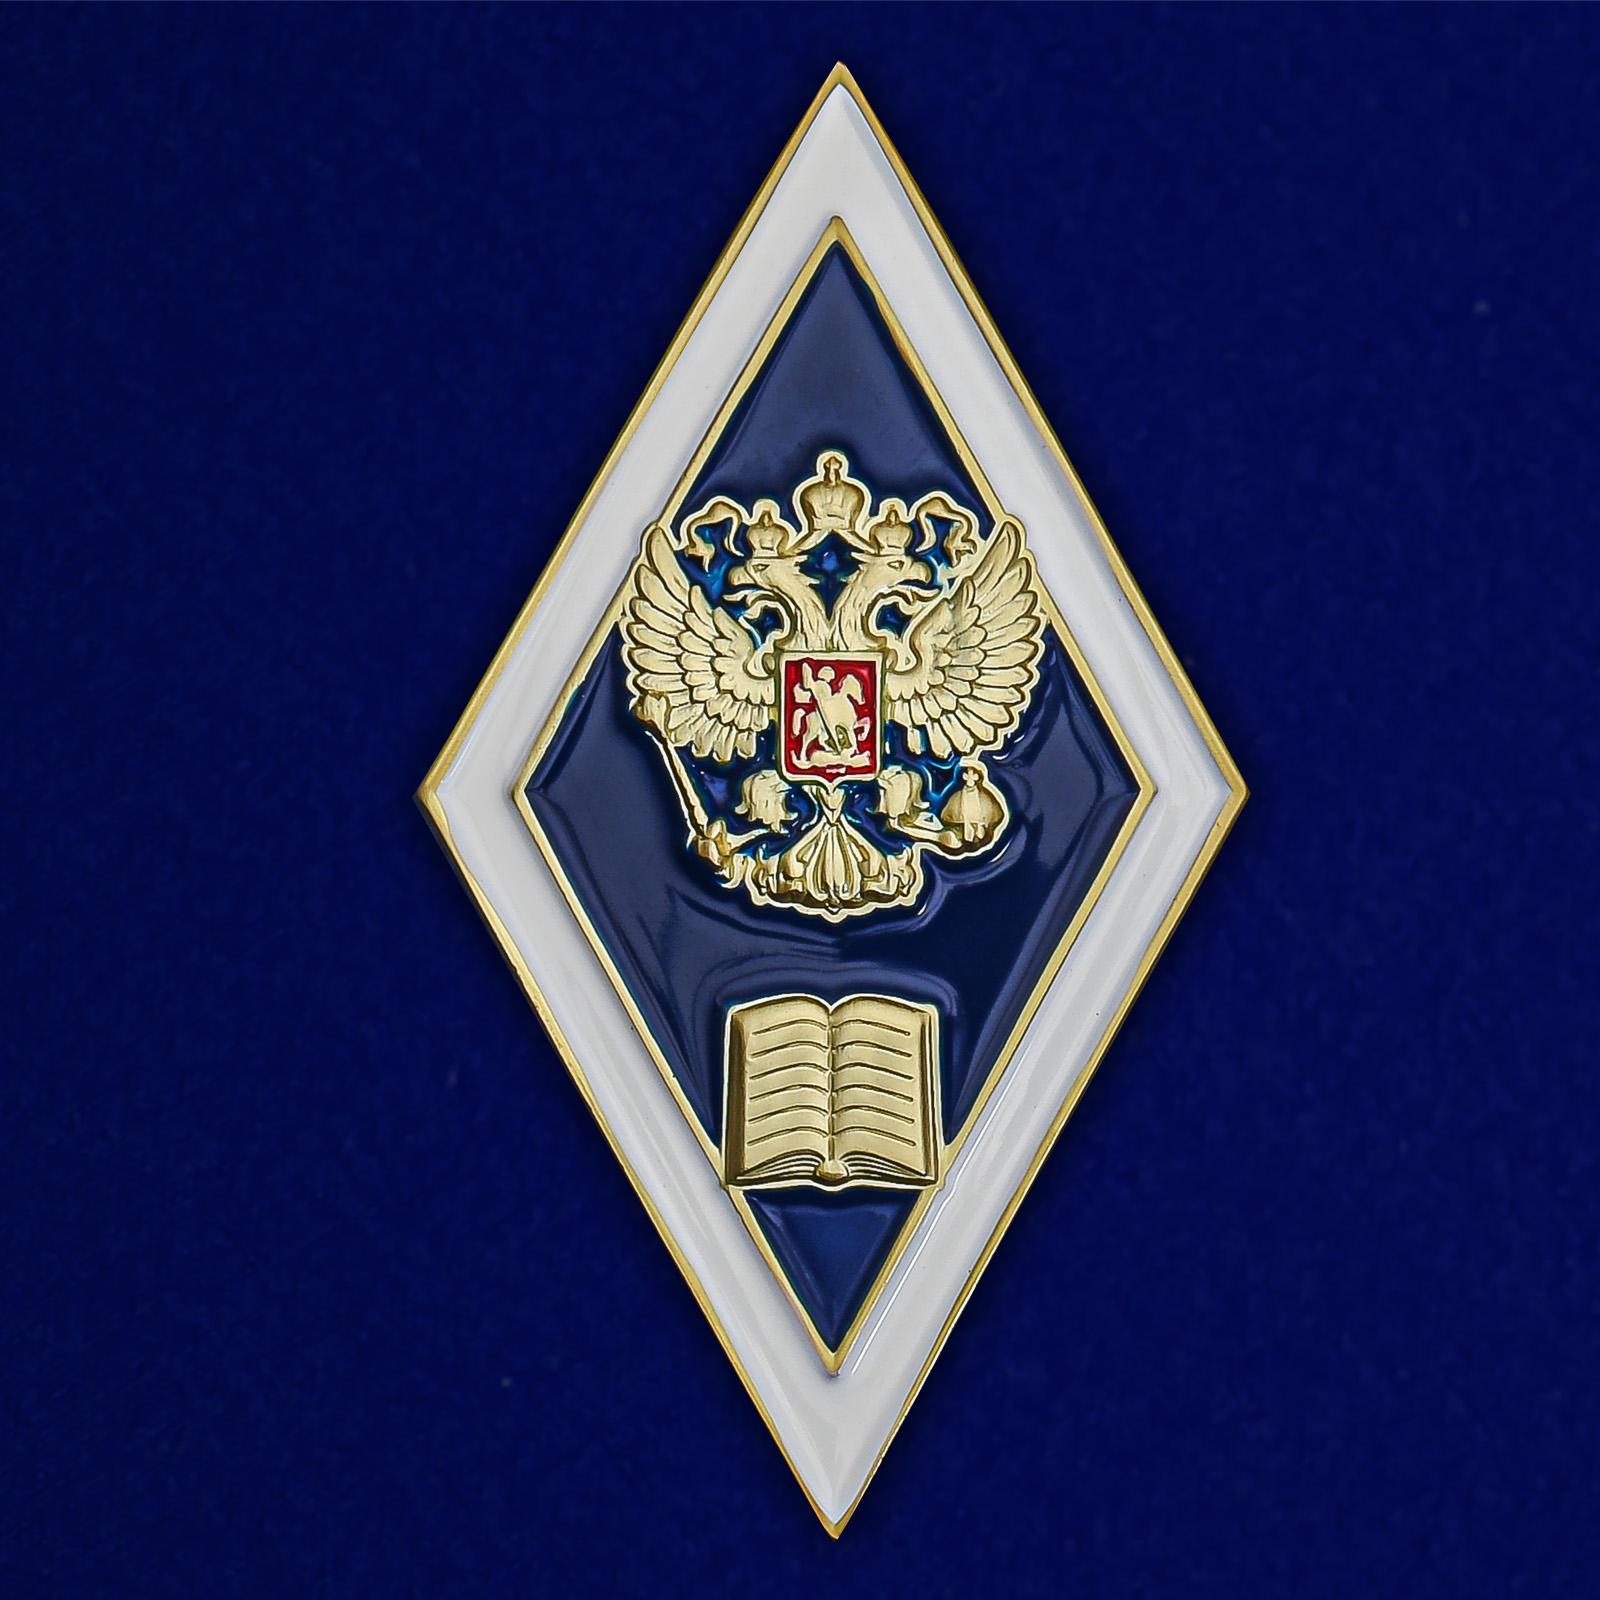 Знак Об окончании гуманитарного ВУЗа РФ